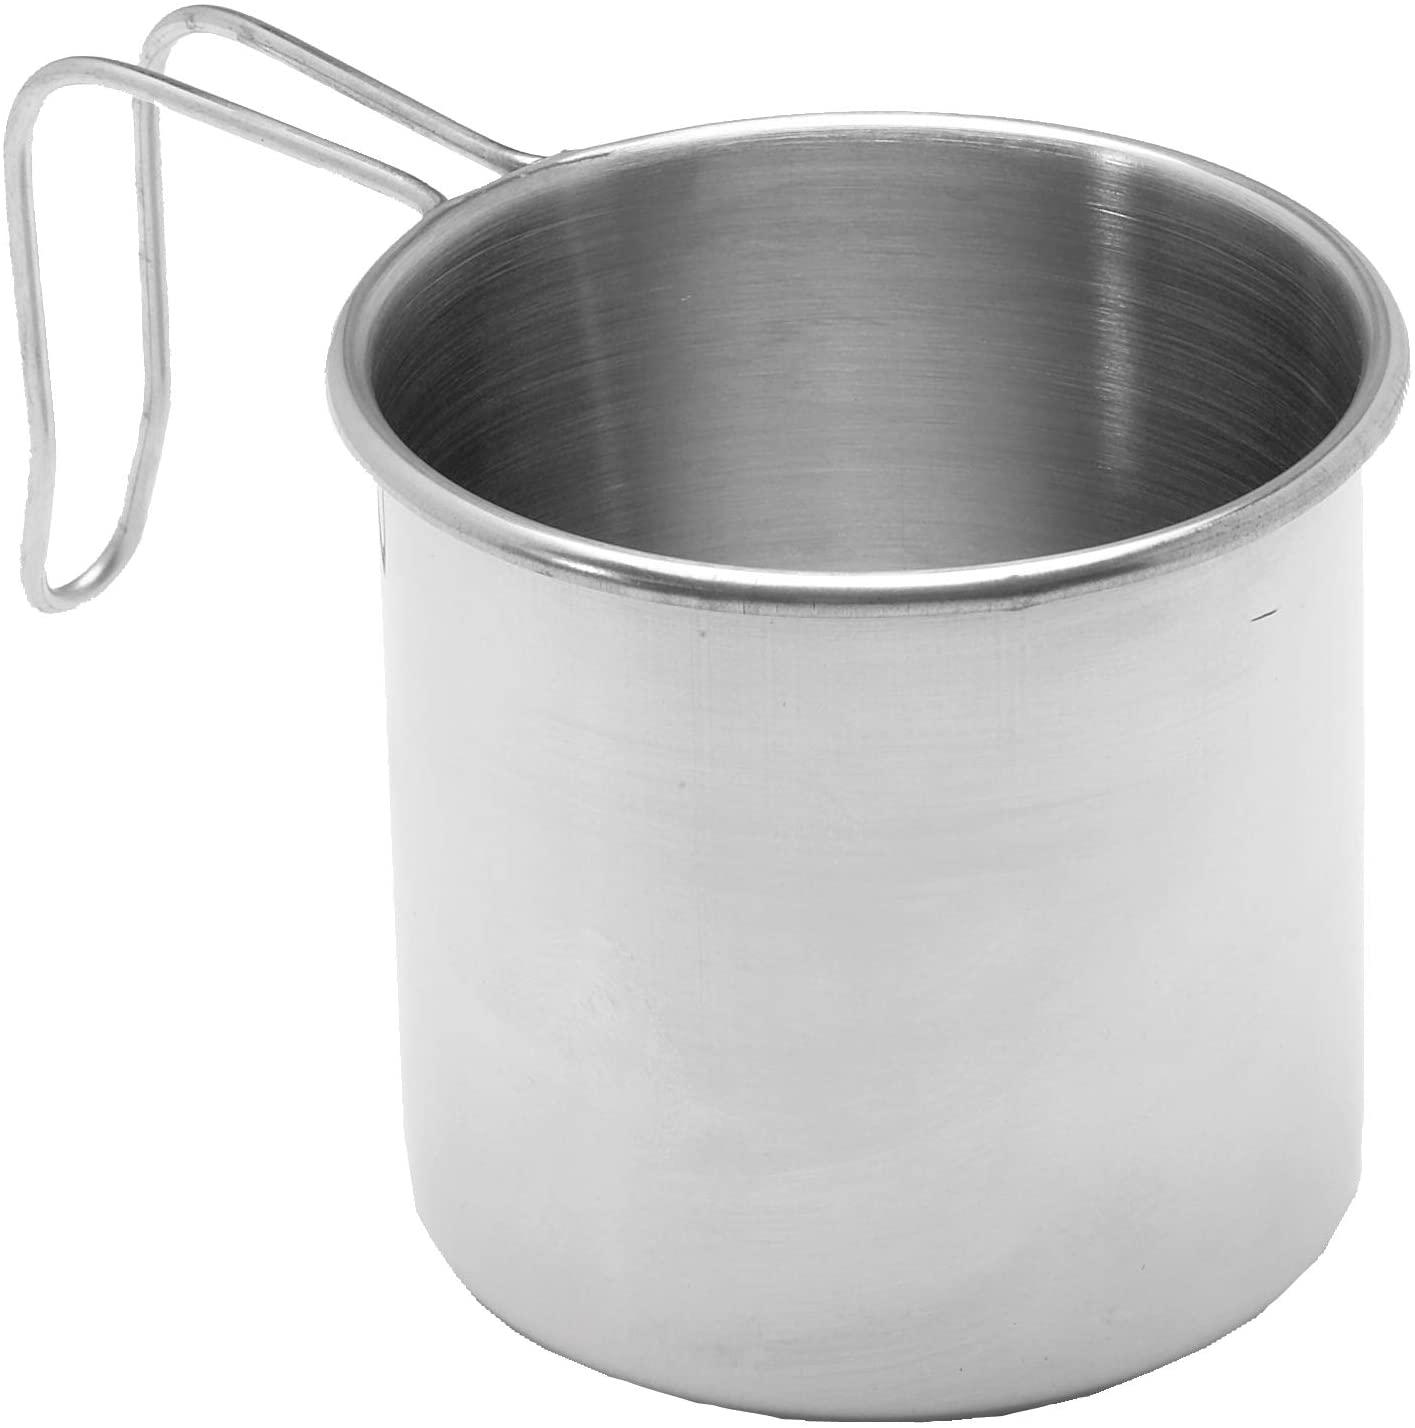 Texsport Stainless Steel 16 Oz. Coffee Cup Mug